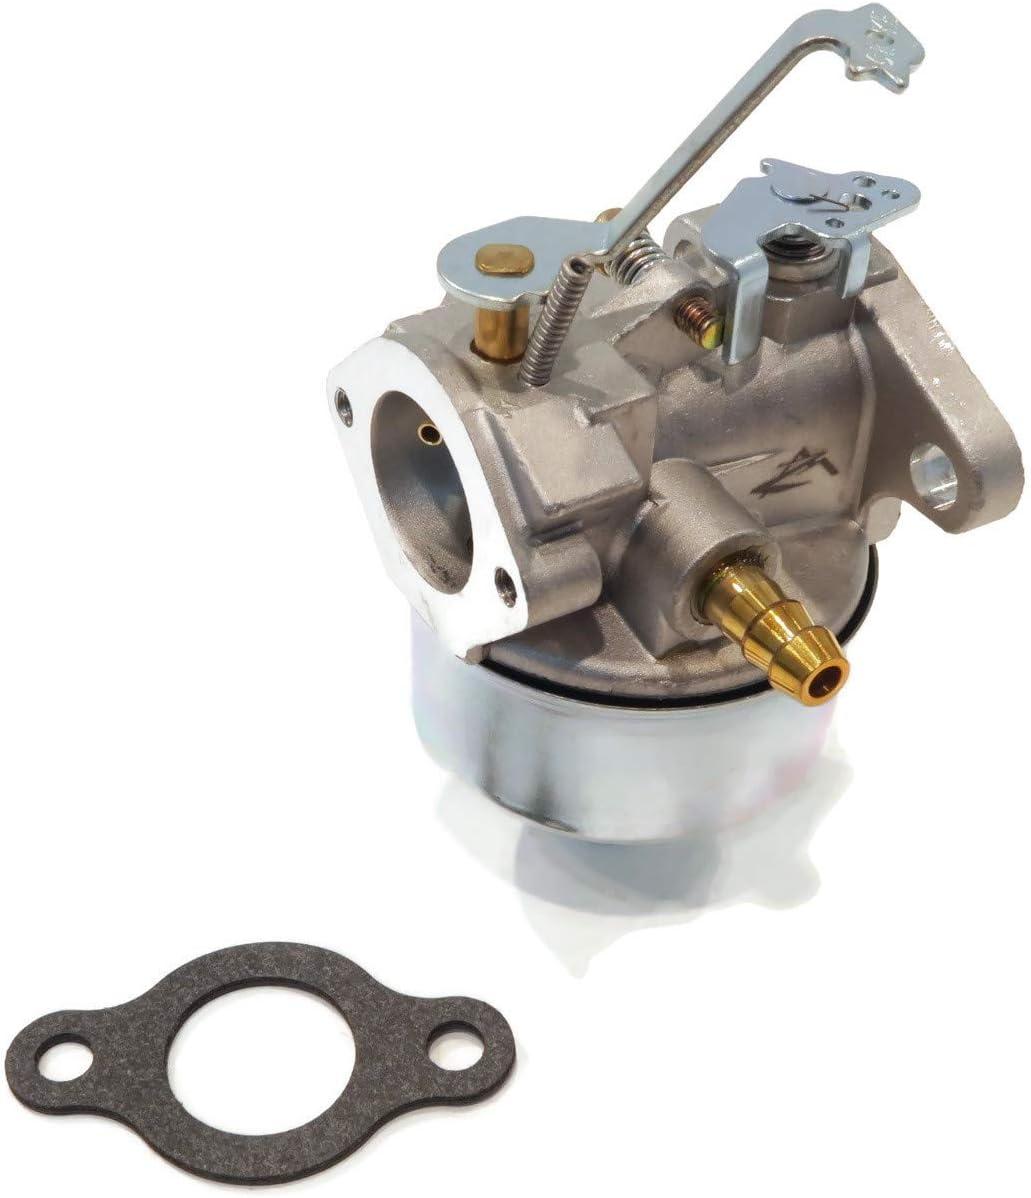 Carburetor Carb for TROY BILT ECONO HORSE TILLER 5hp 6hp H50 H60 HH60 Motors